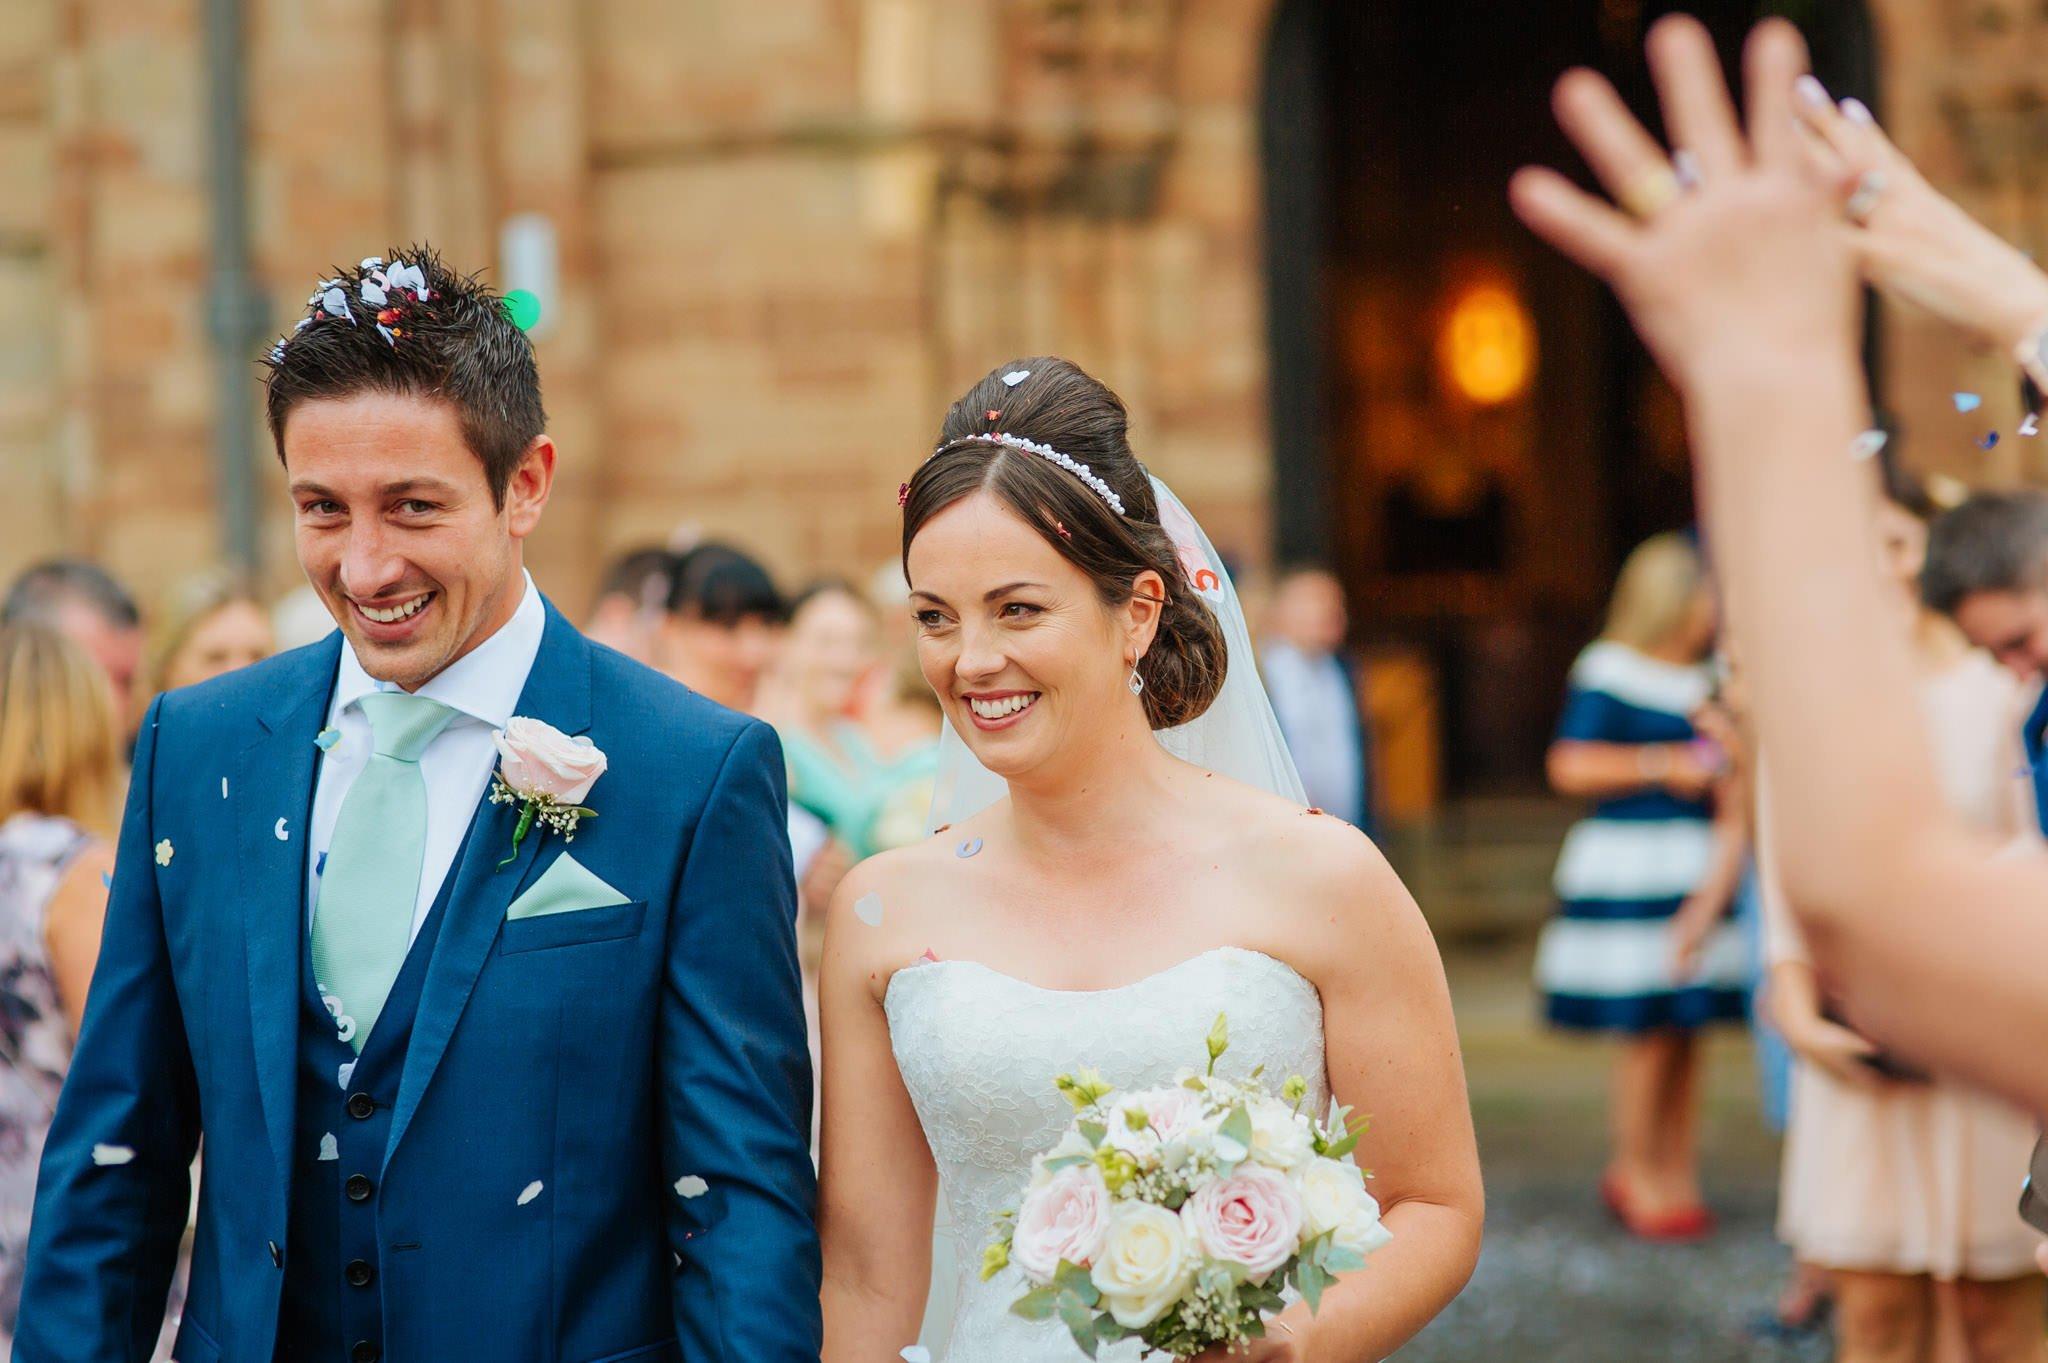 Eastnor Castle wedding photographer Herefordshire, West Midlands - Sarah + Dean 34